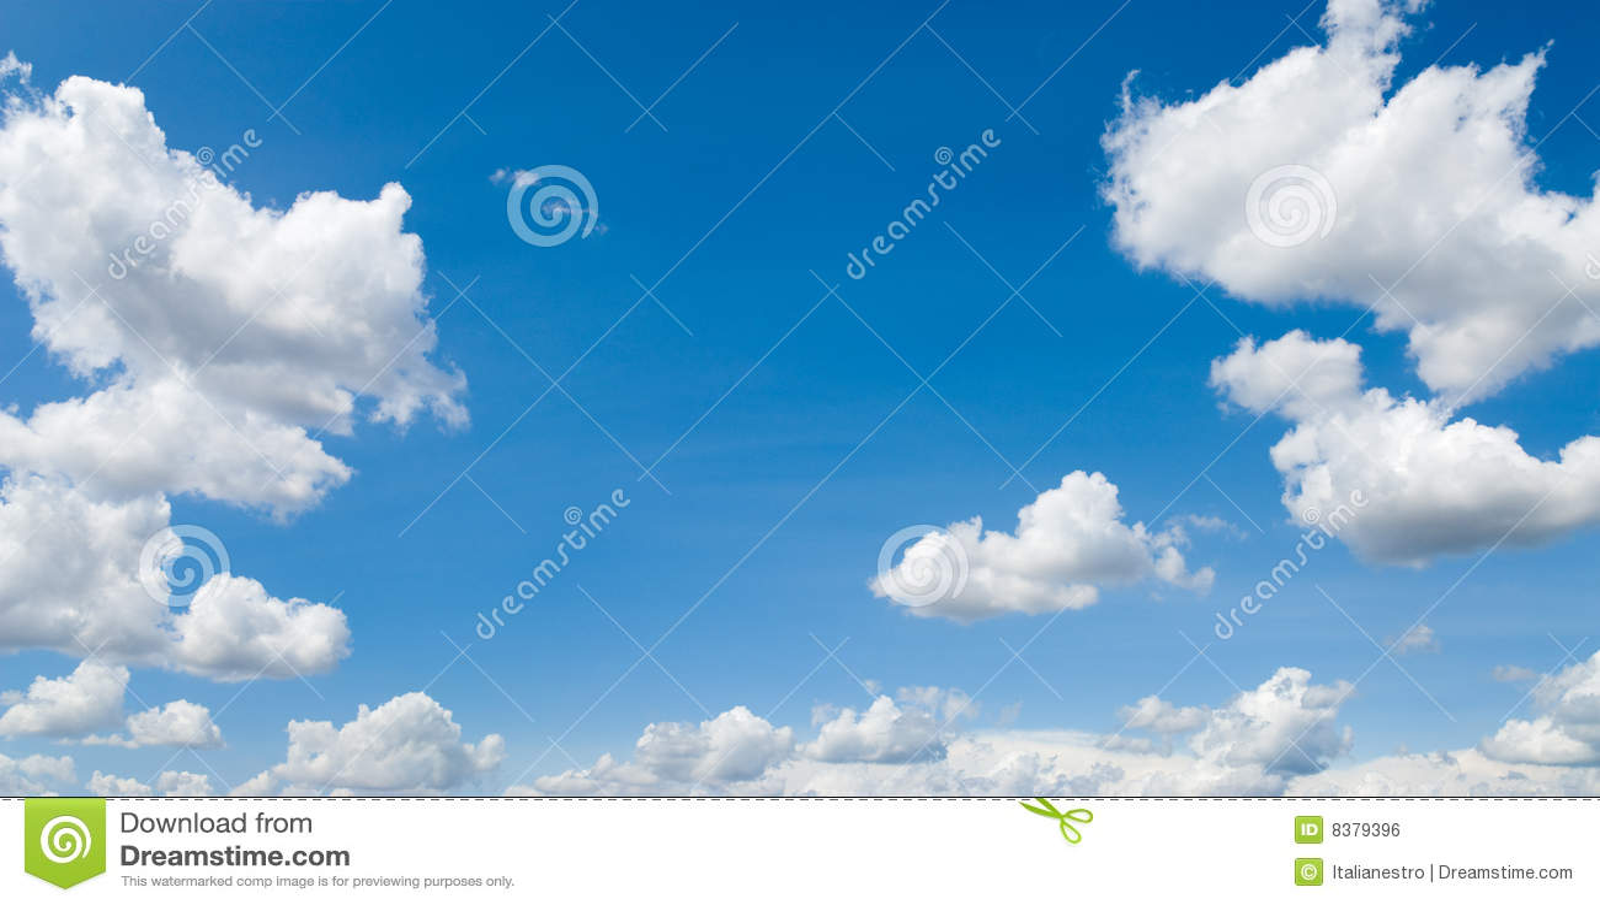 Himmel scape